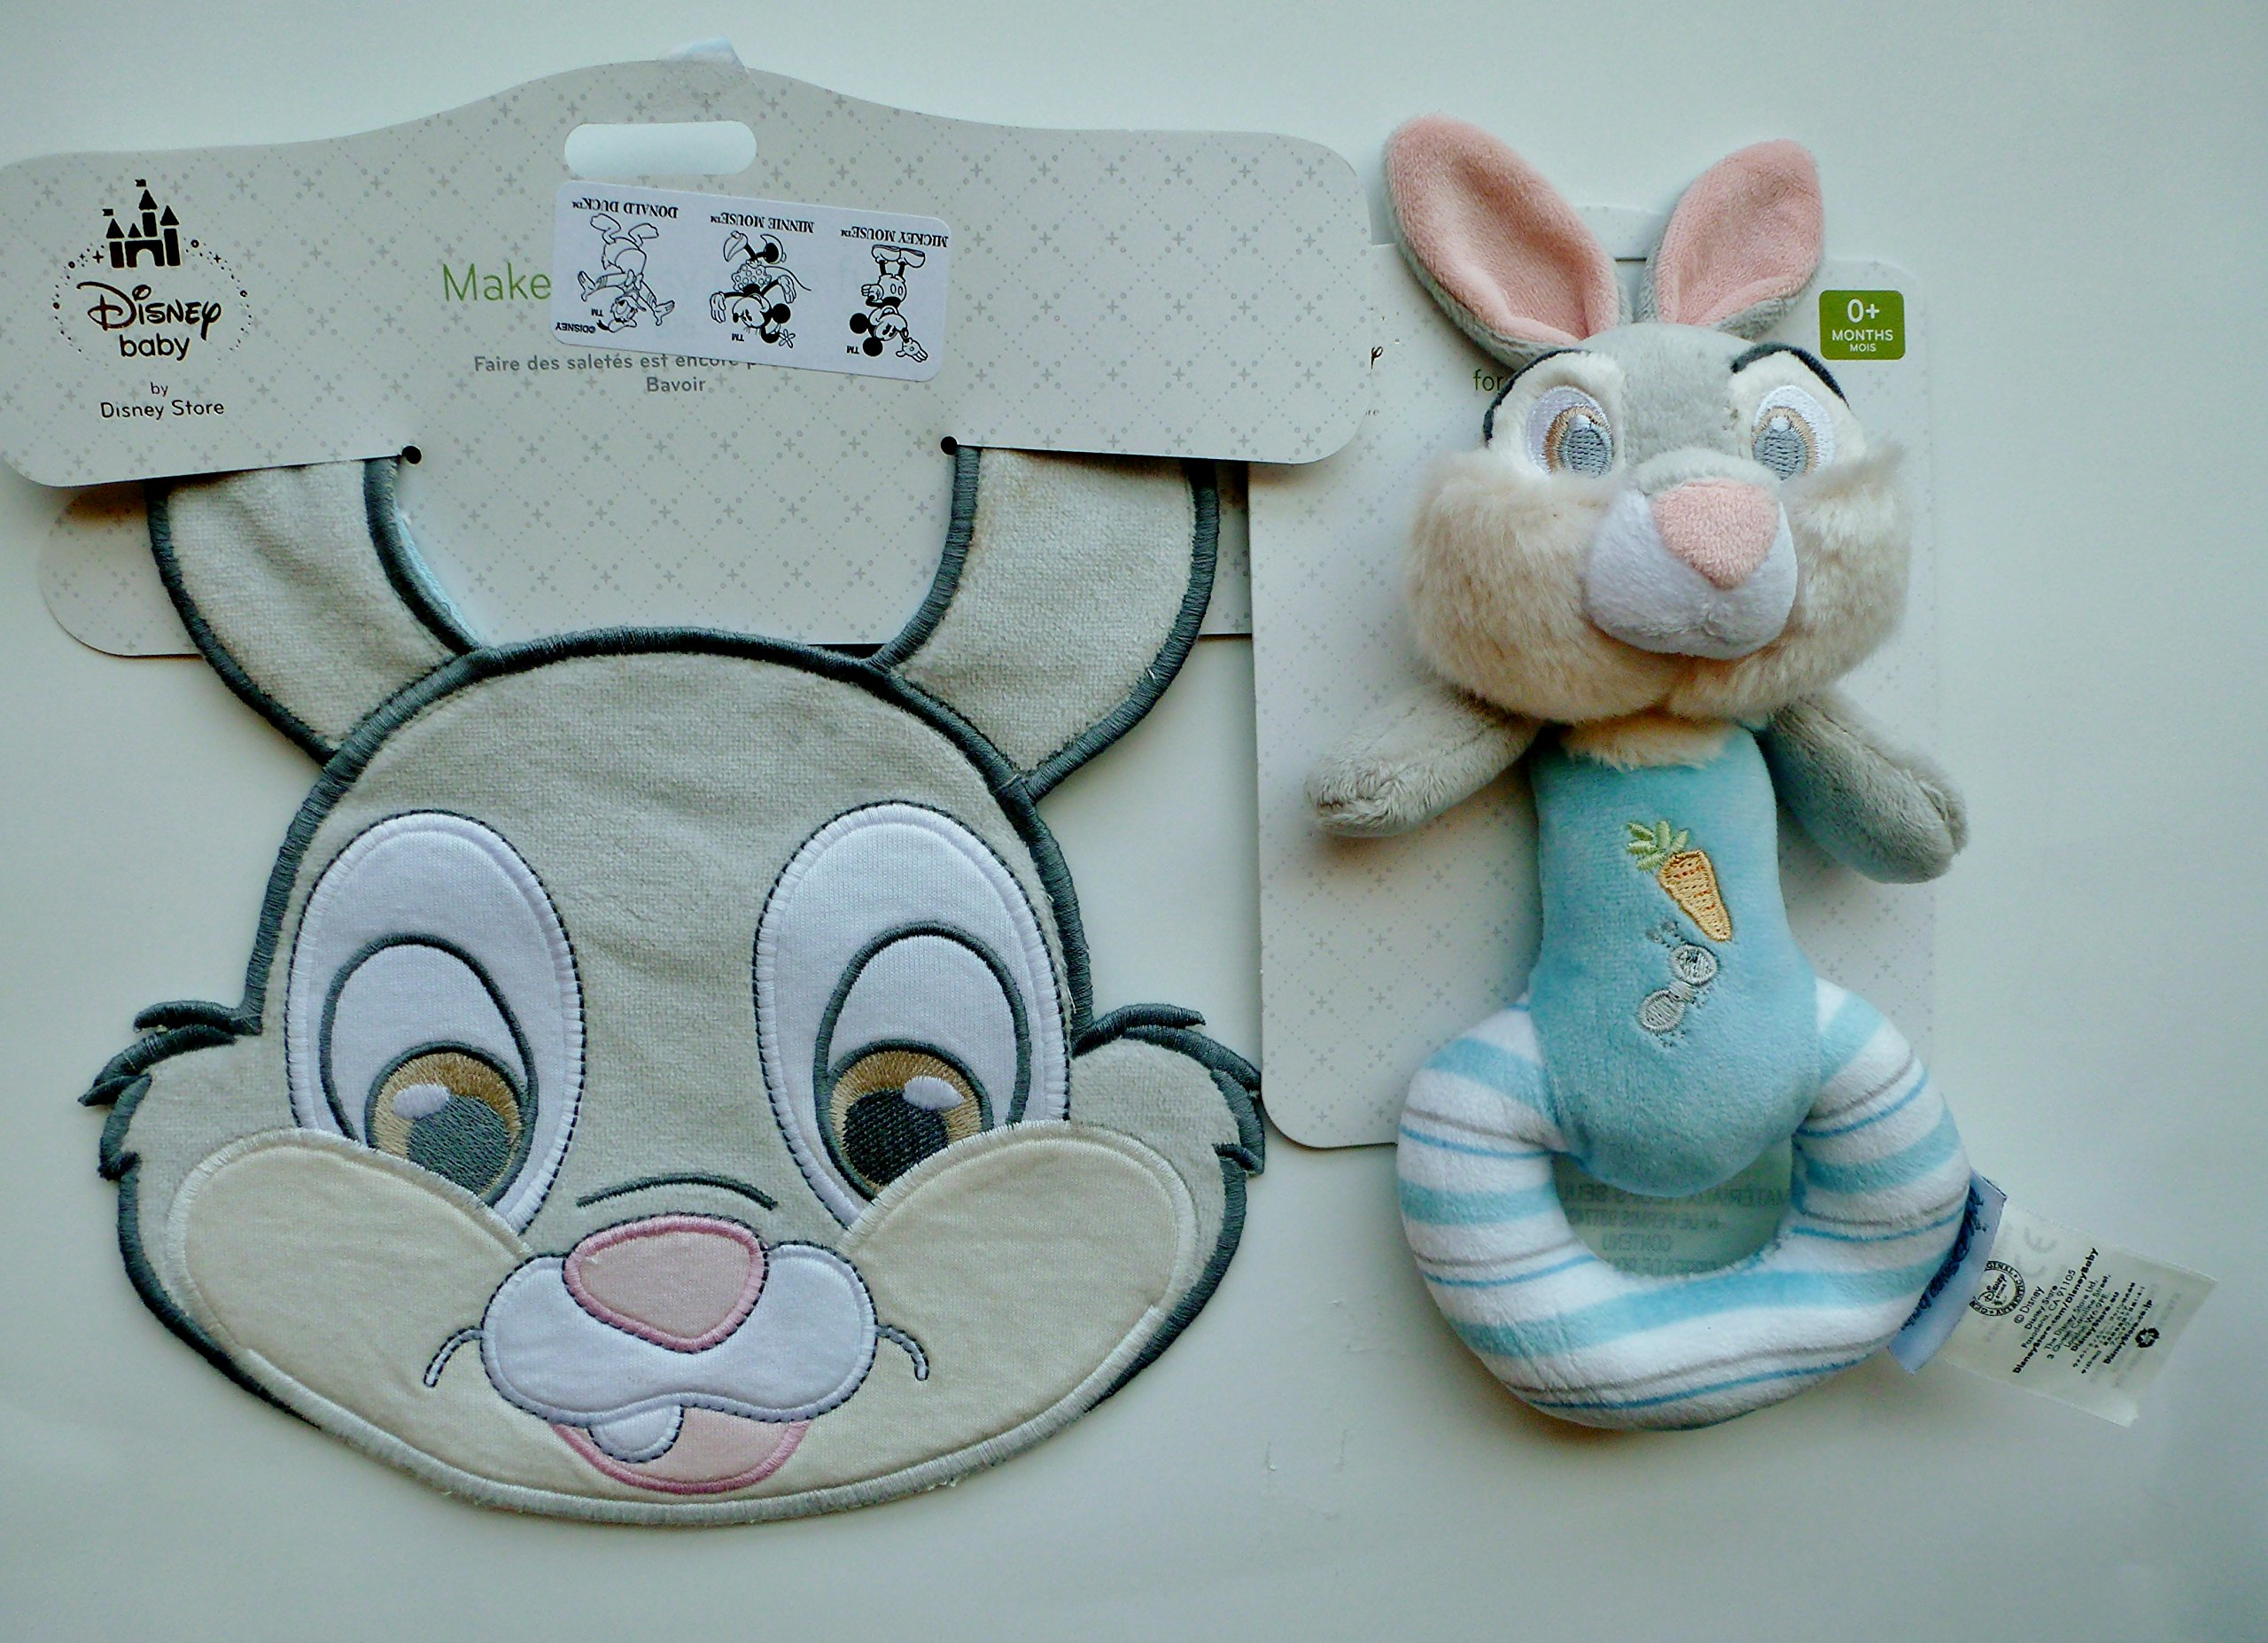 Disney Thumper the Bunnie Plush Rattle for Baby & Matching Bib